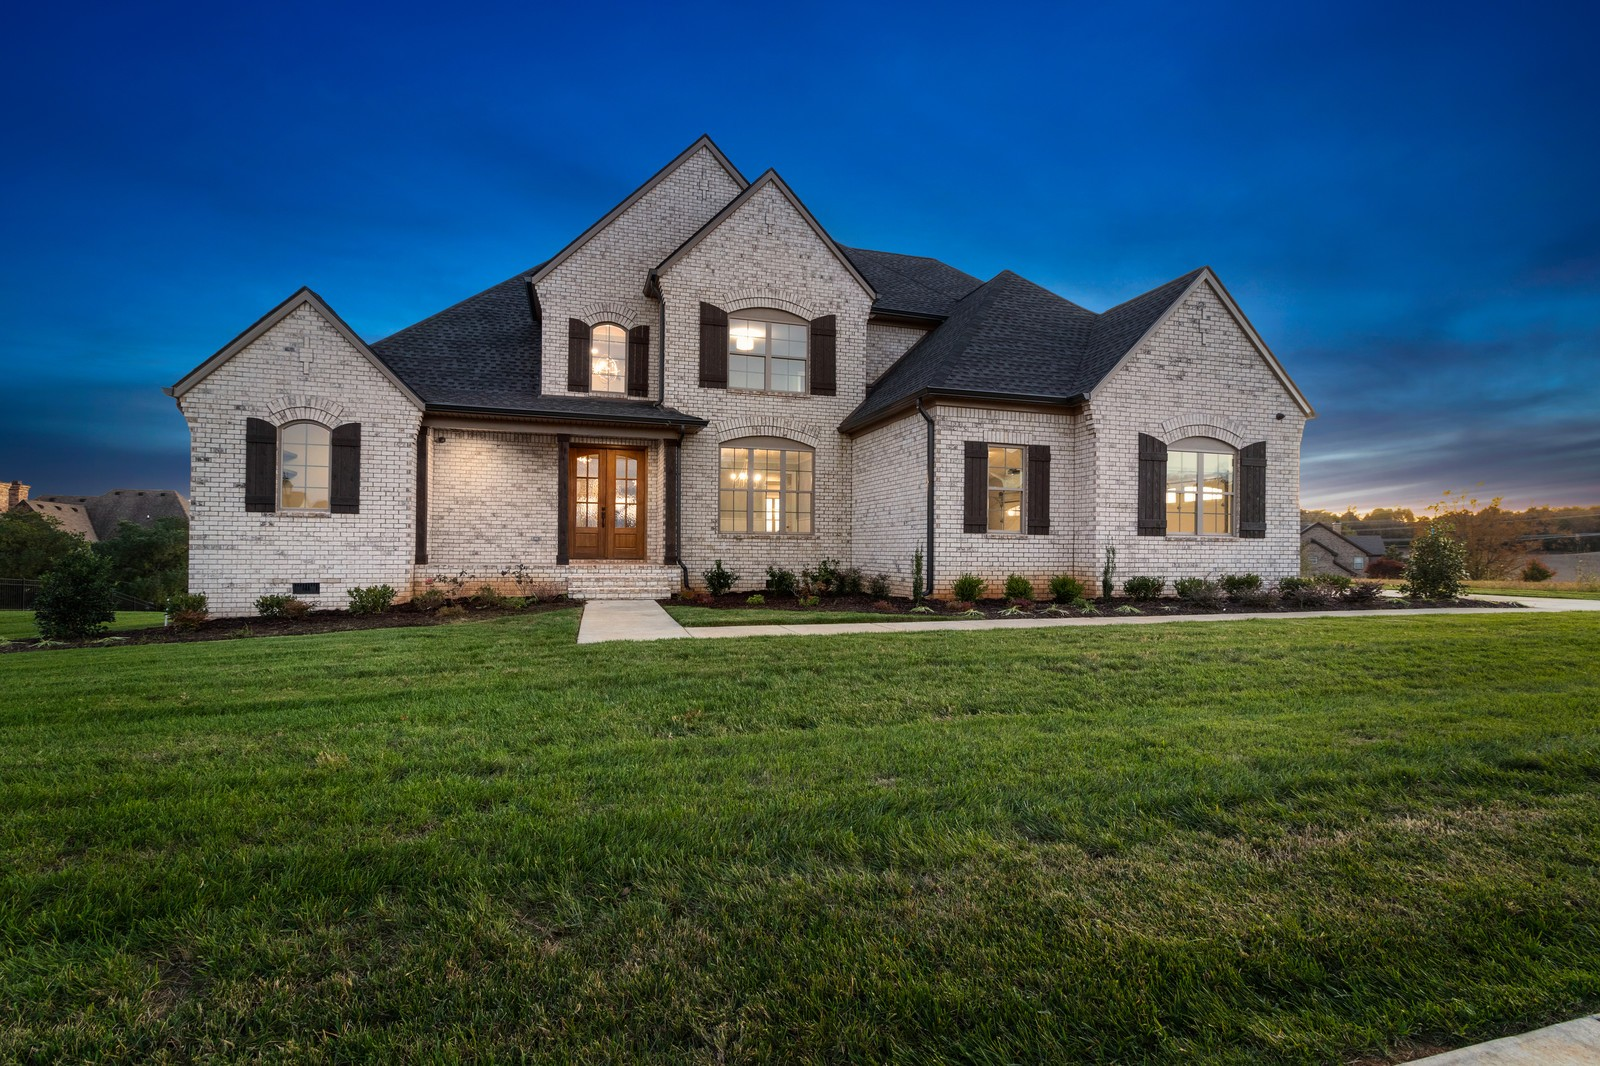 1468 Collins View Way, Clarksville, TN 37043 - Clarksville, TN real estate listing